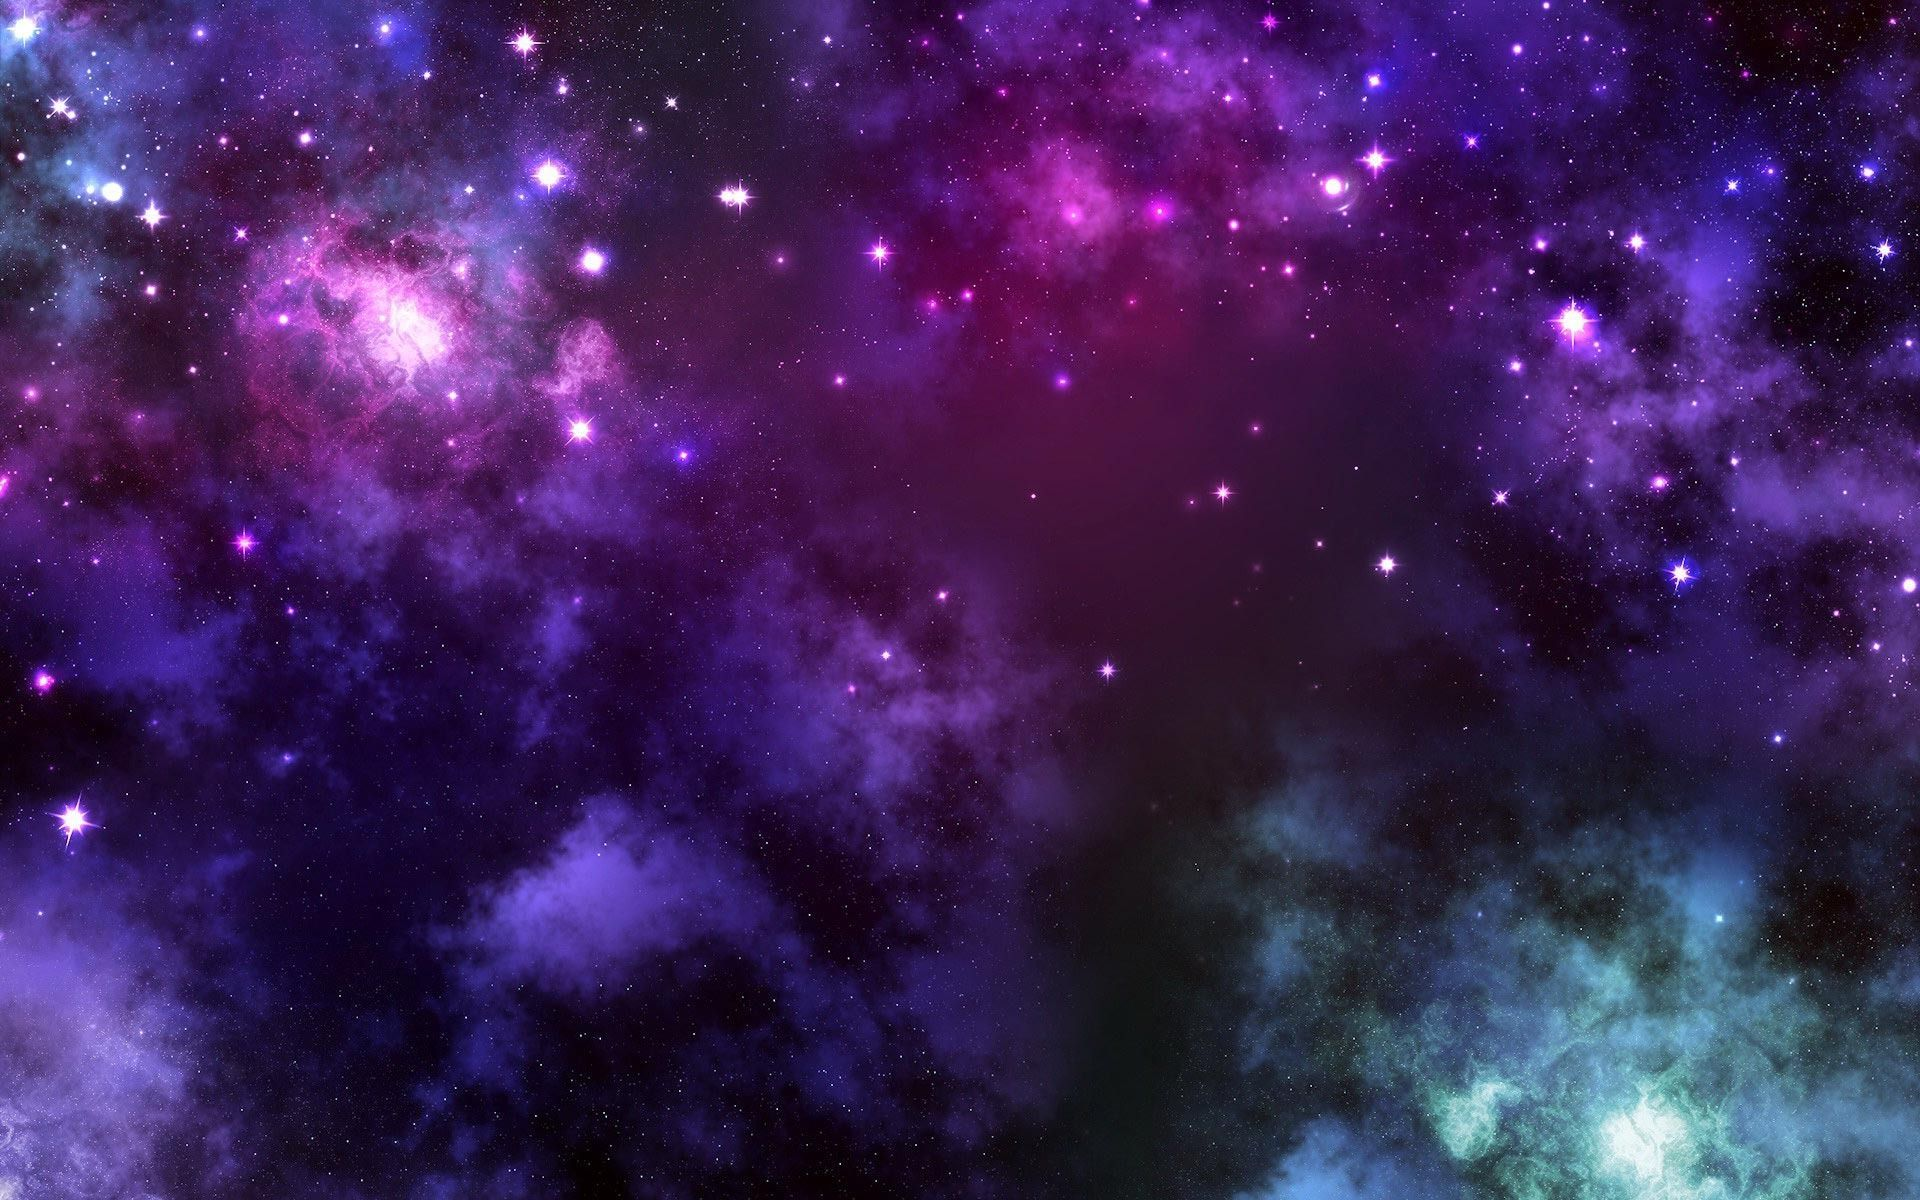 1191x670 Purple Space Galaxy Wallpaper Download 11403